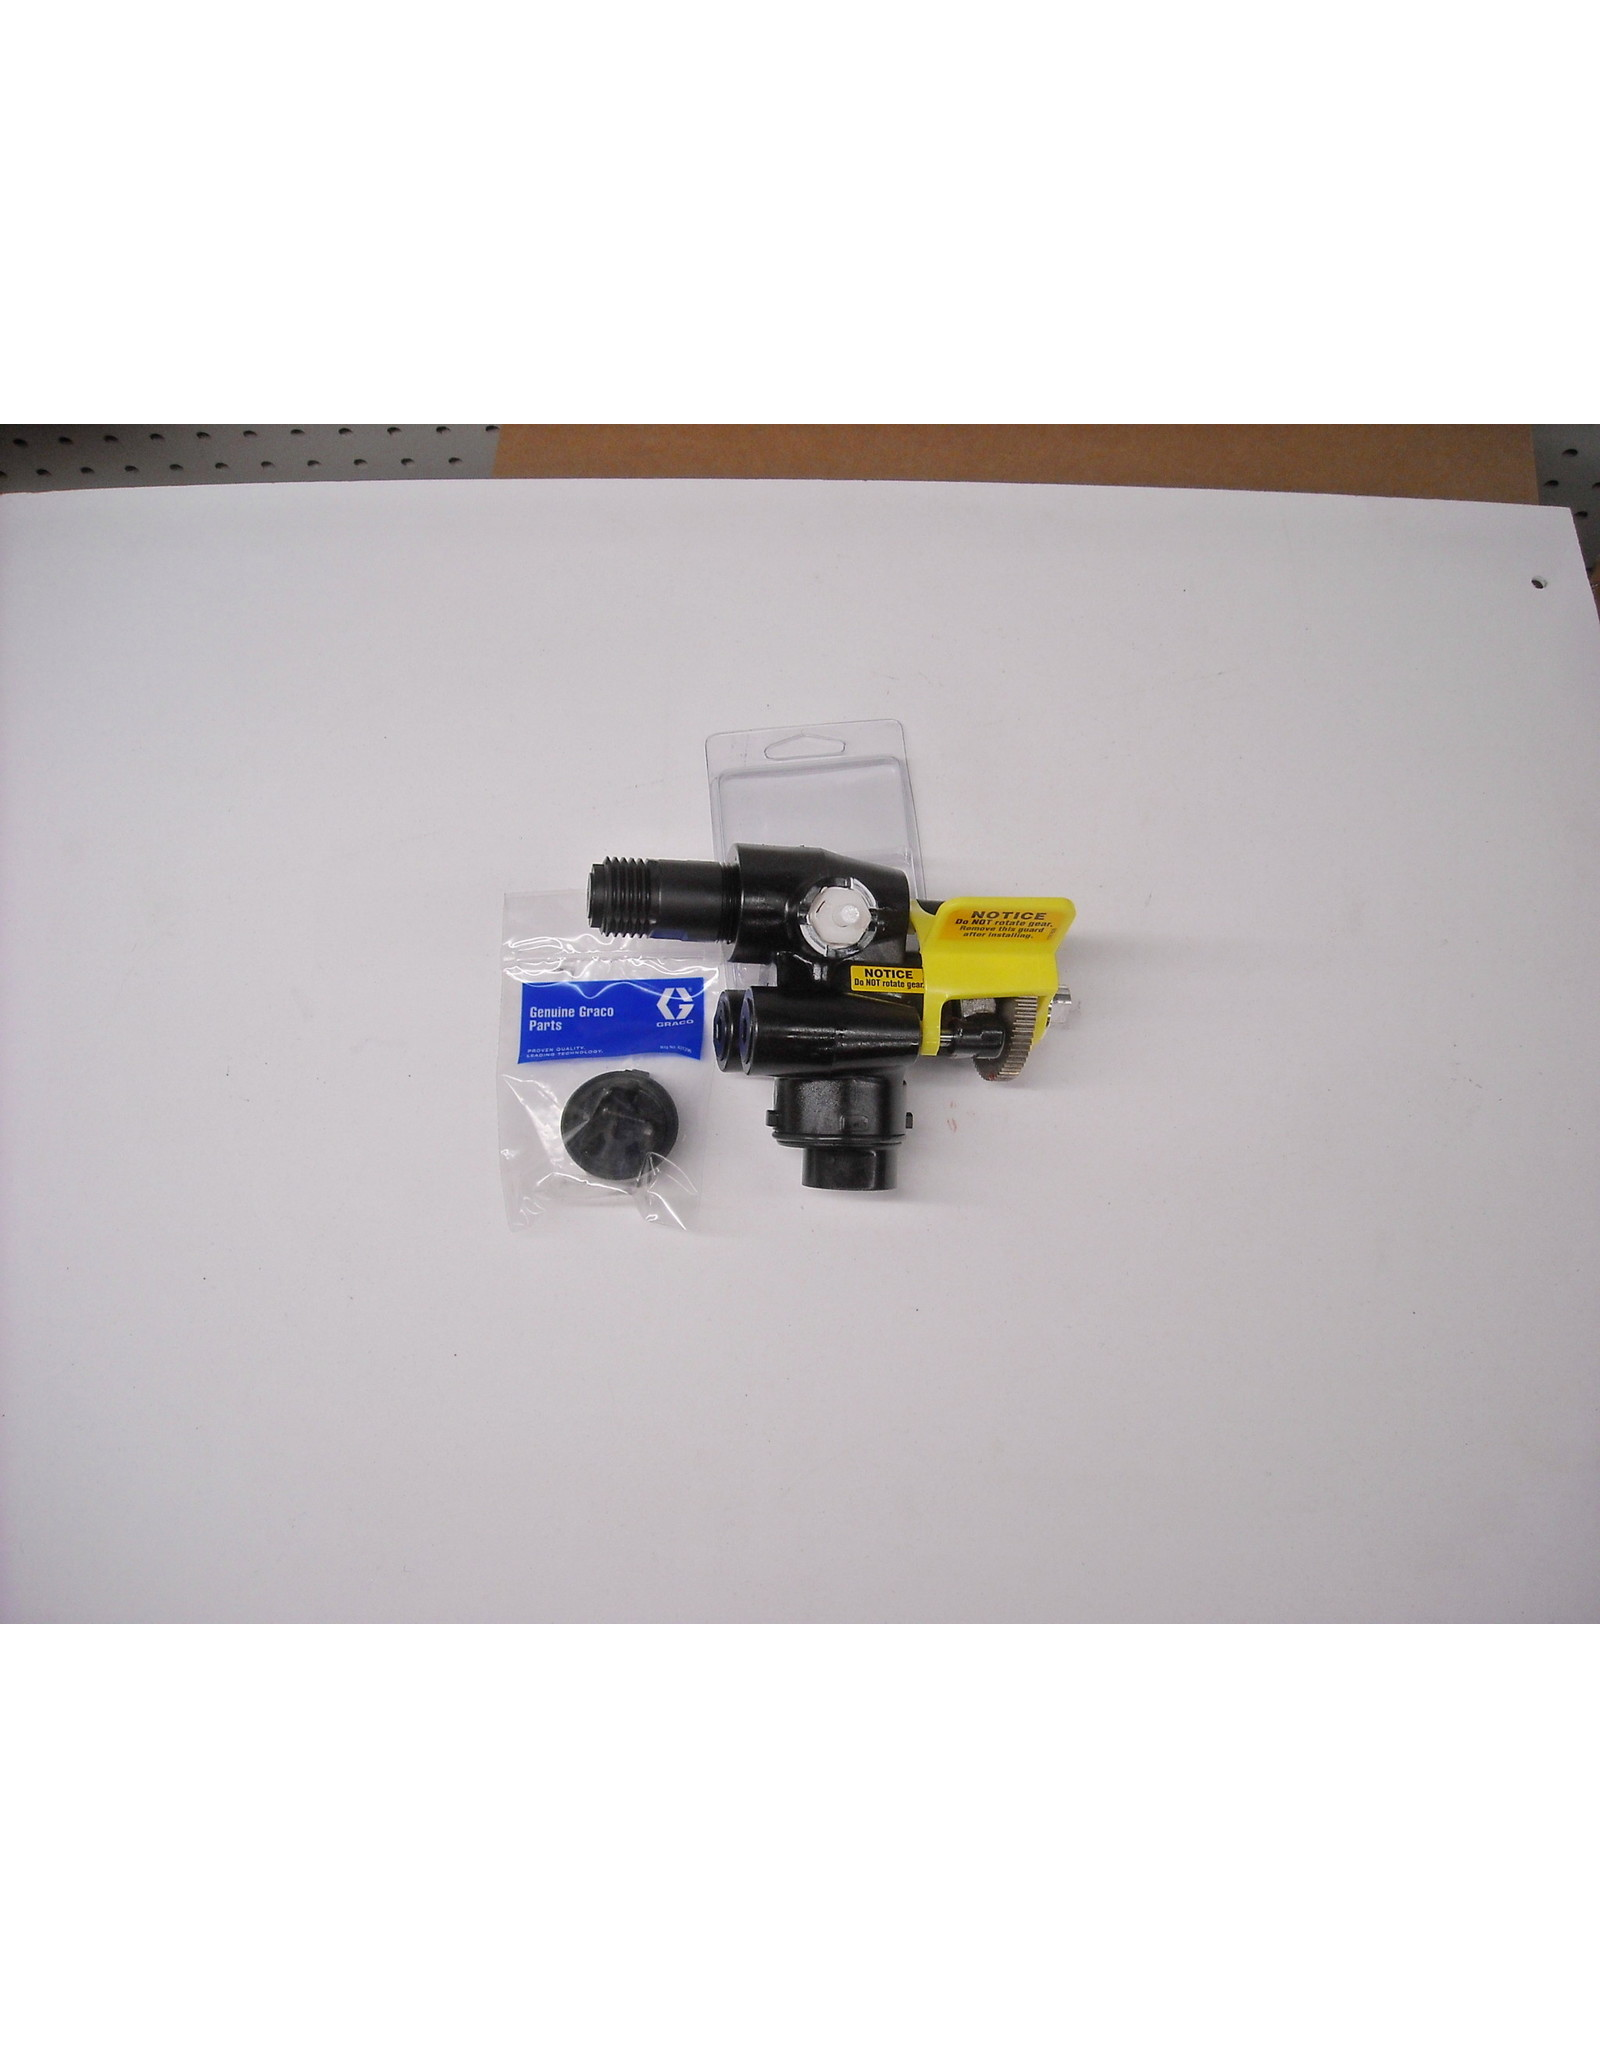 Graco 17P187 Fluid Section